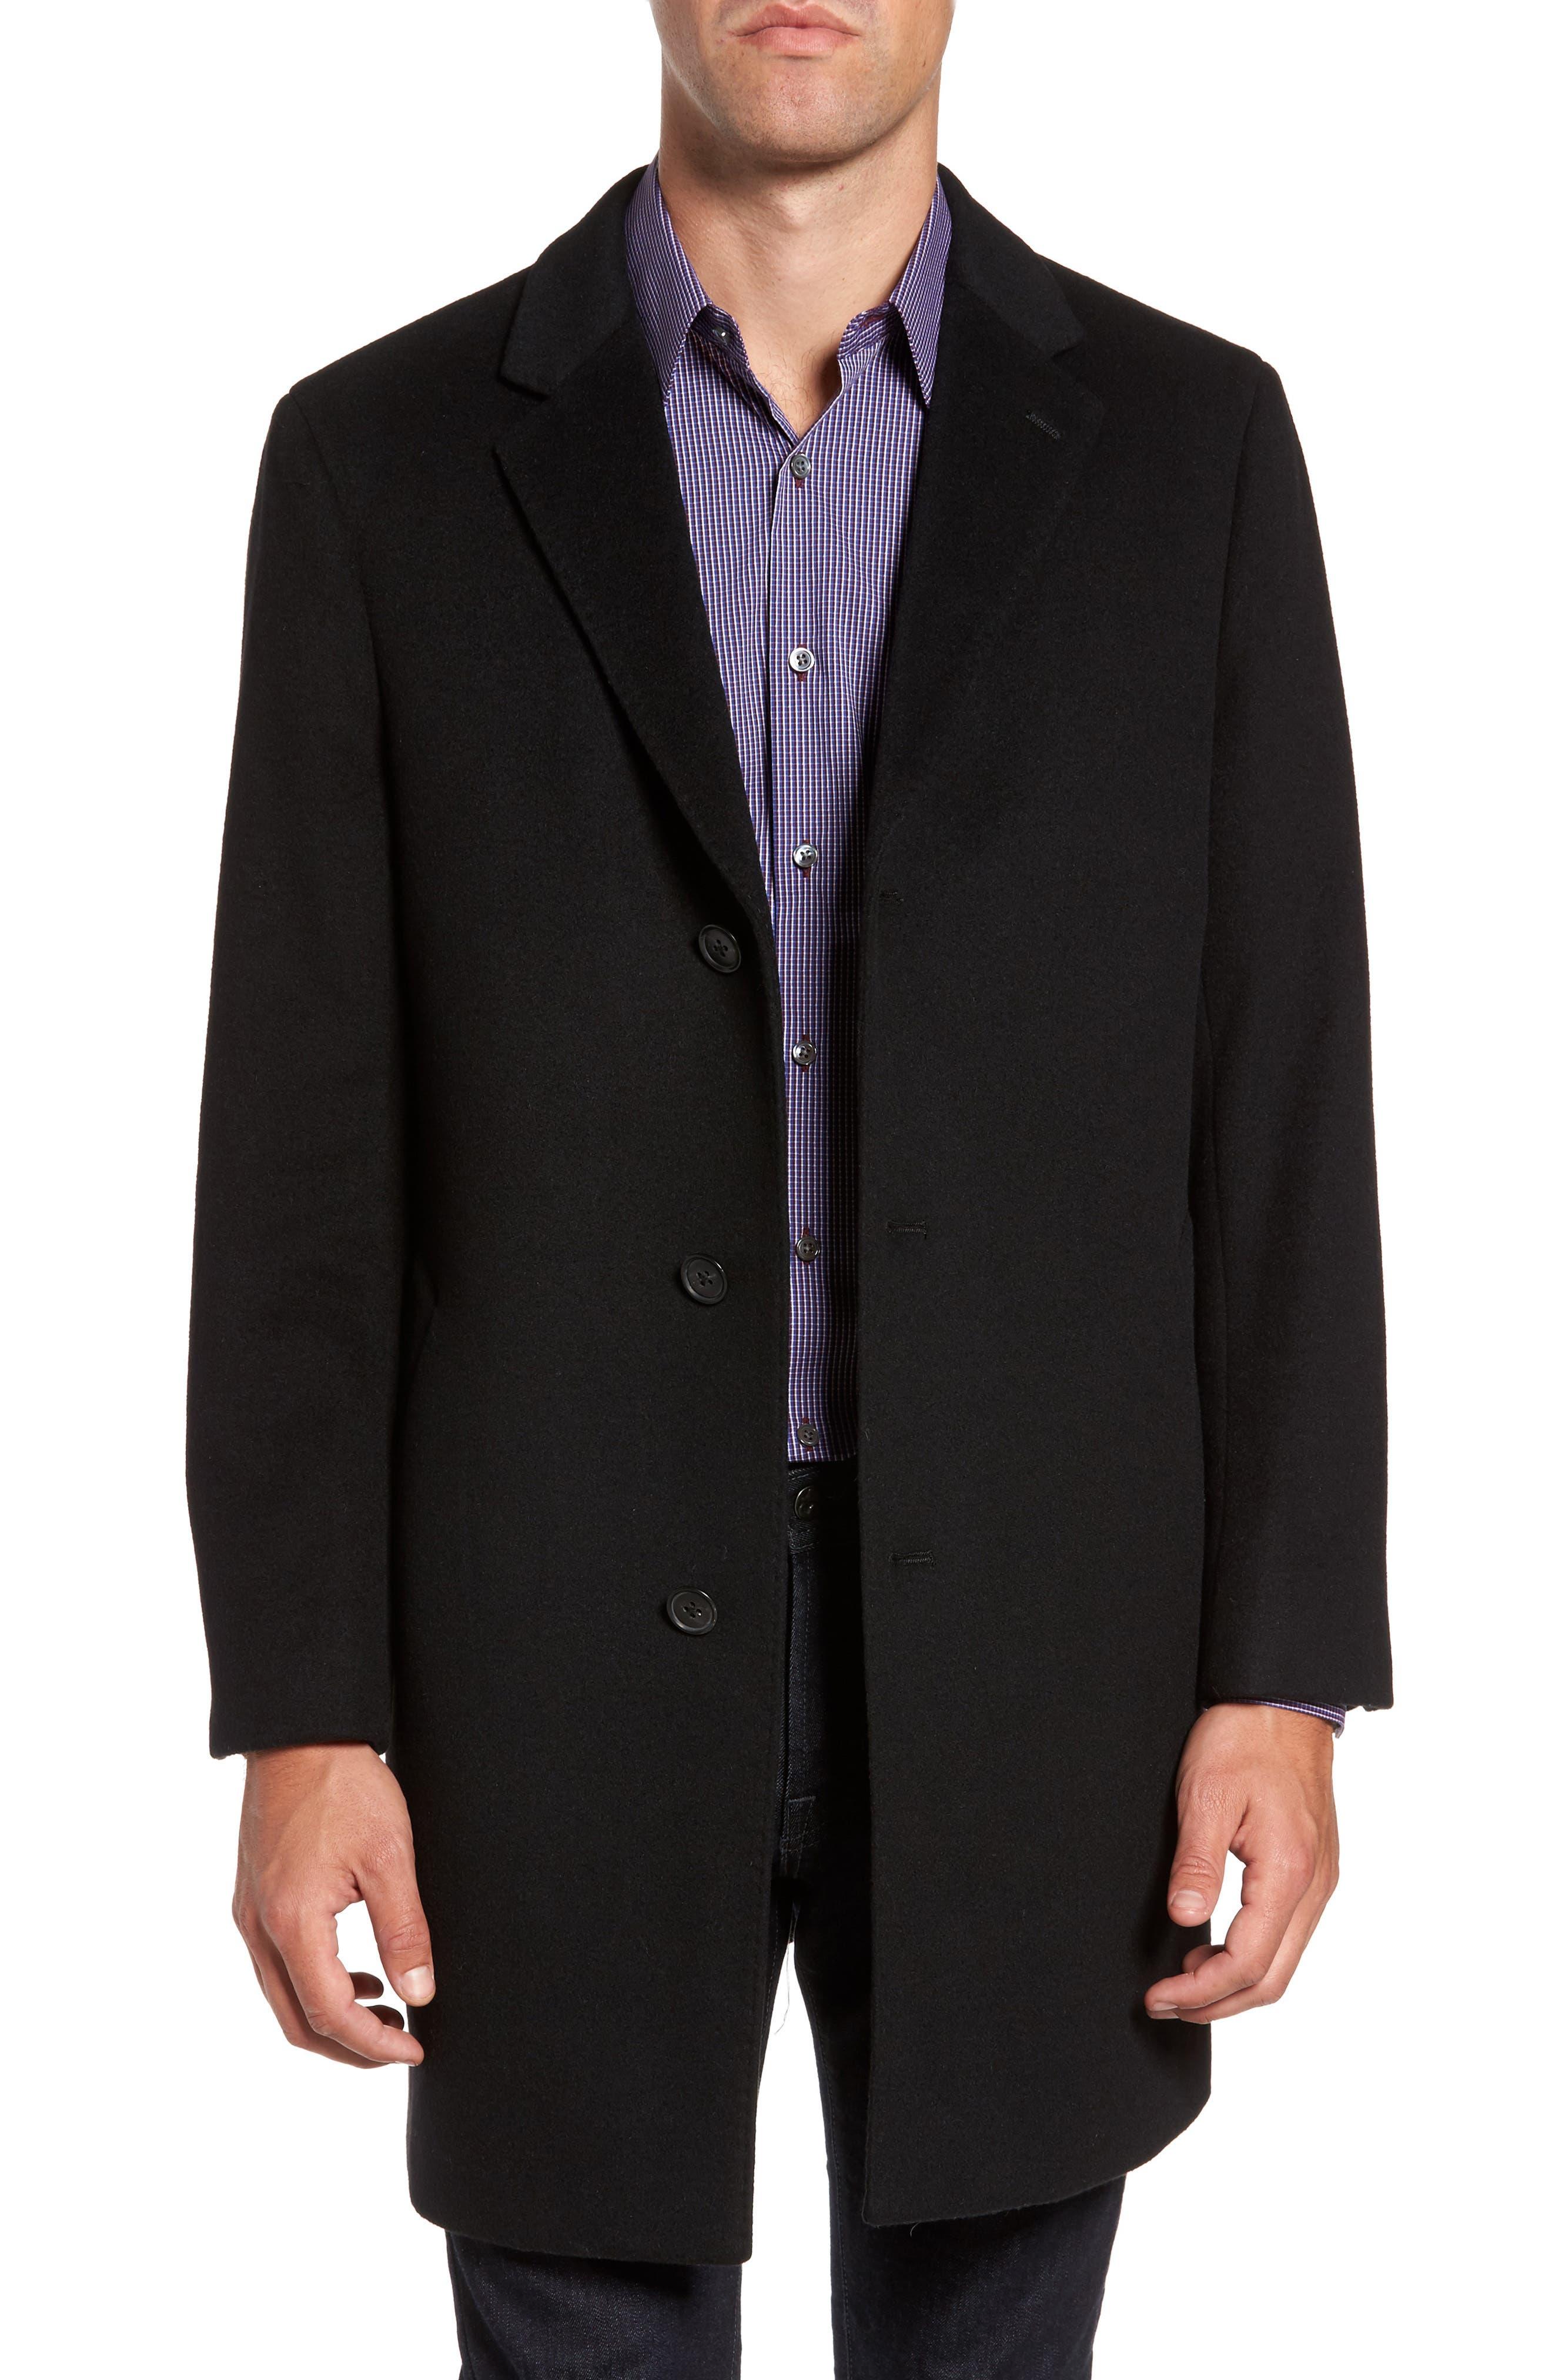 Mason Wool & Cashmere Overcoat,                             Main thumbnail 1, color,                             001